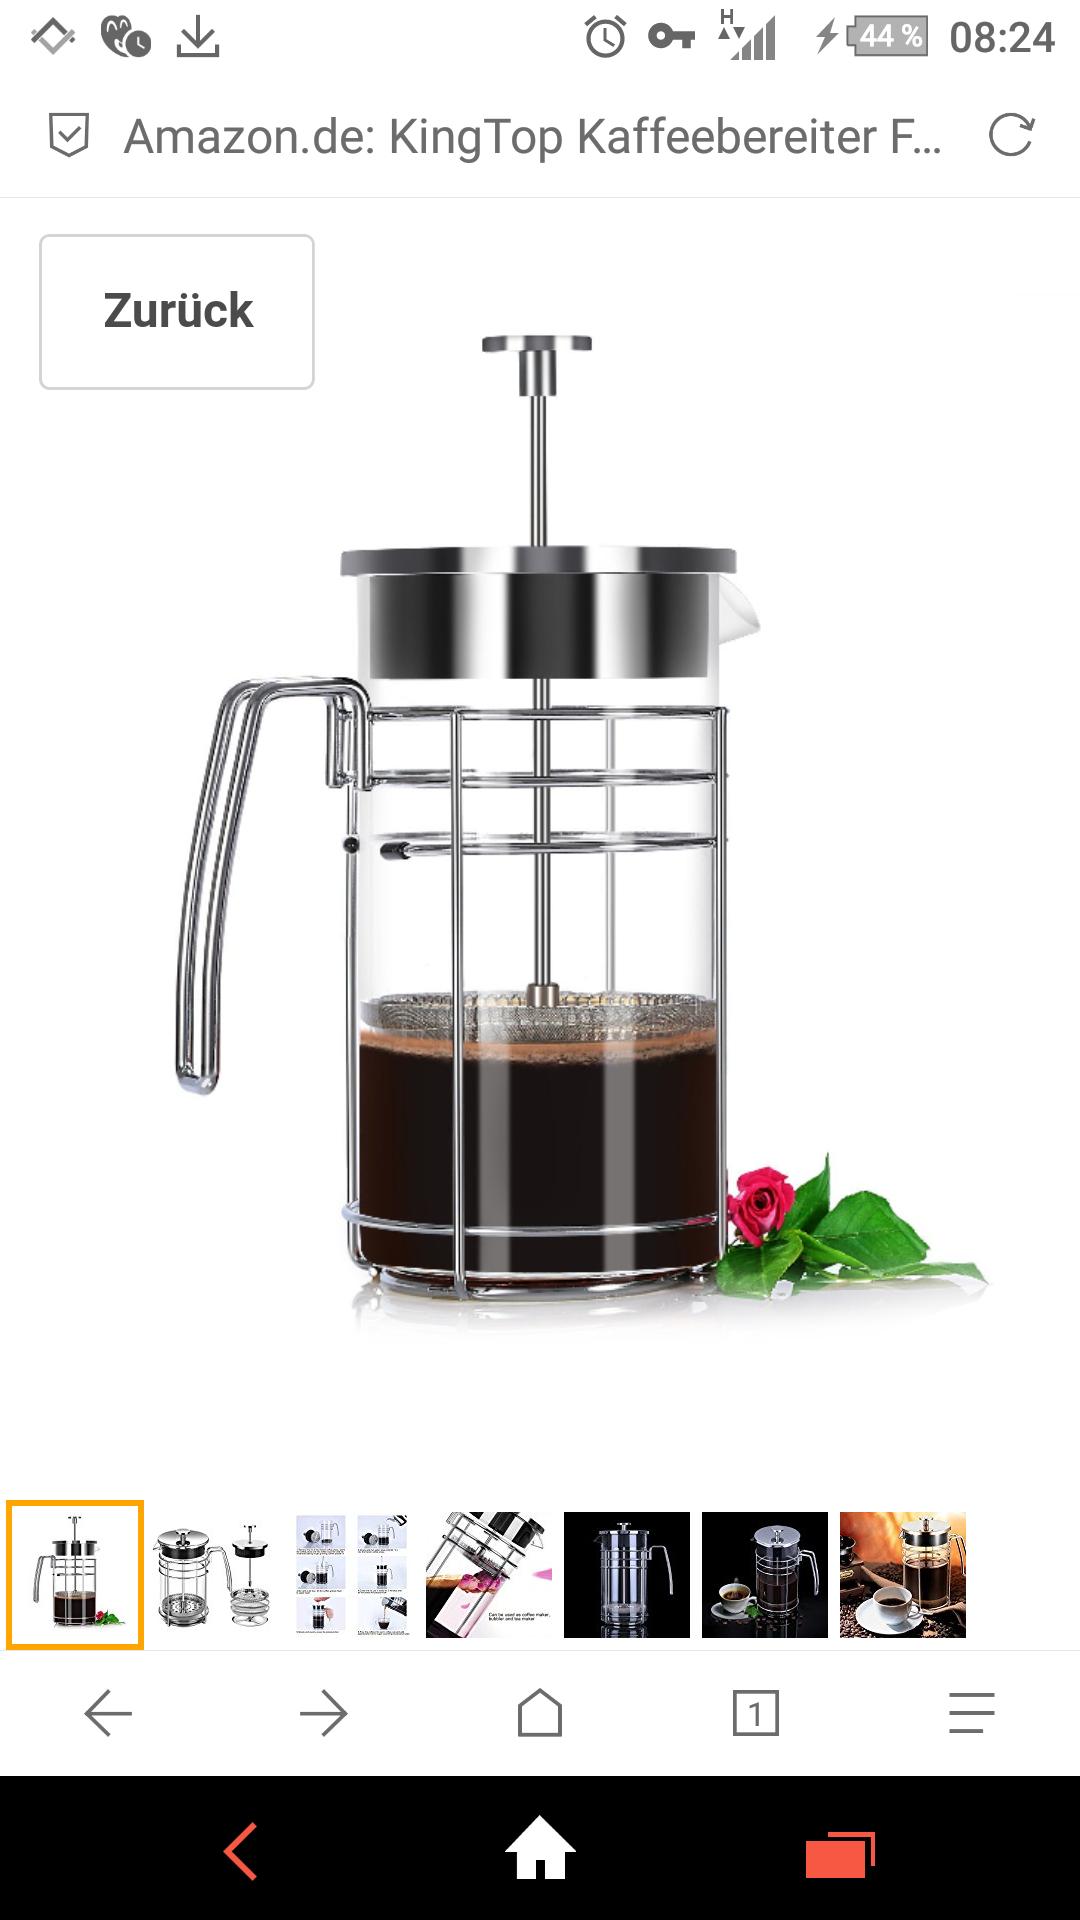 KingTop Kaffeebereiter 1L (-40% Preisnachlass) [Amazon]